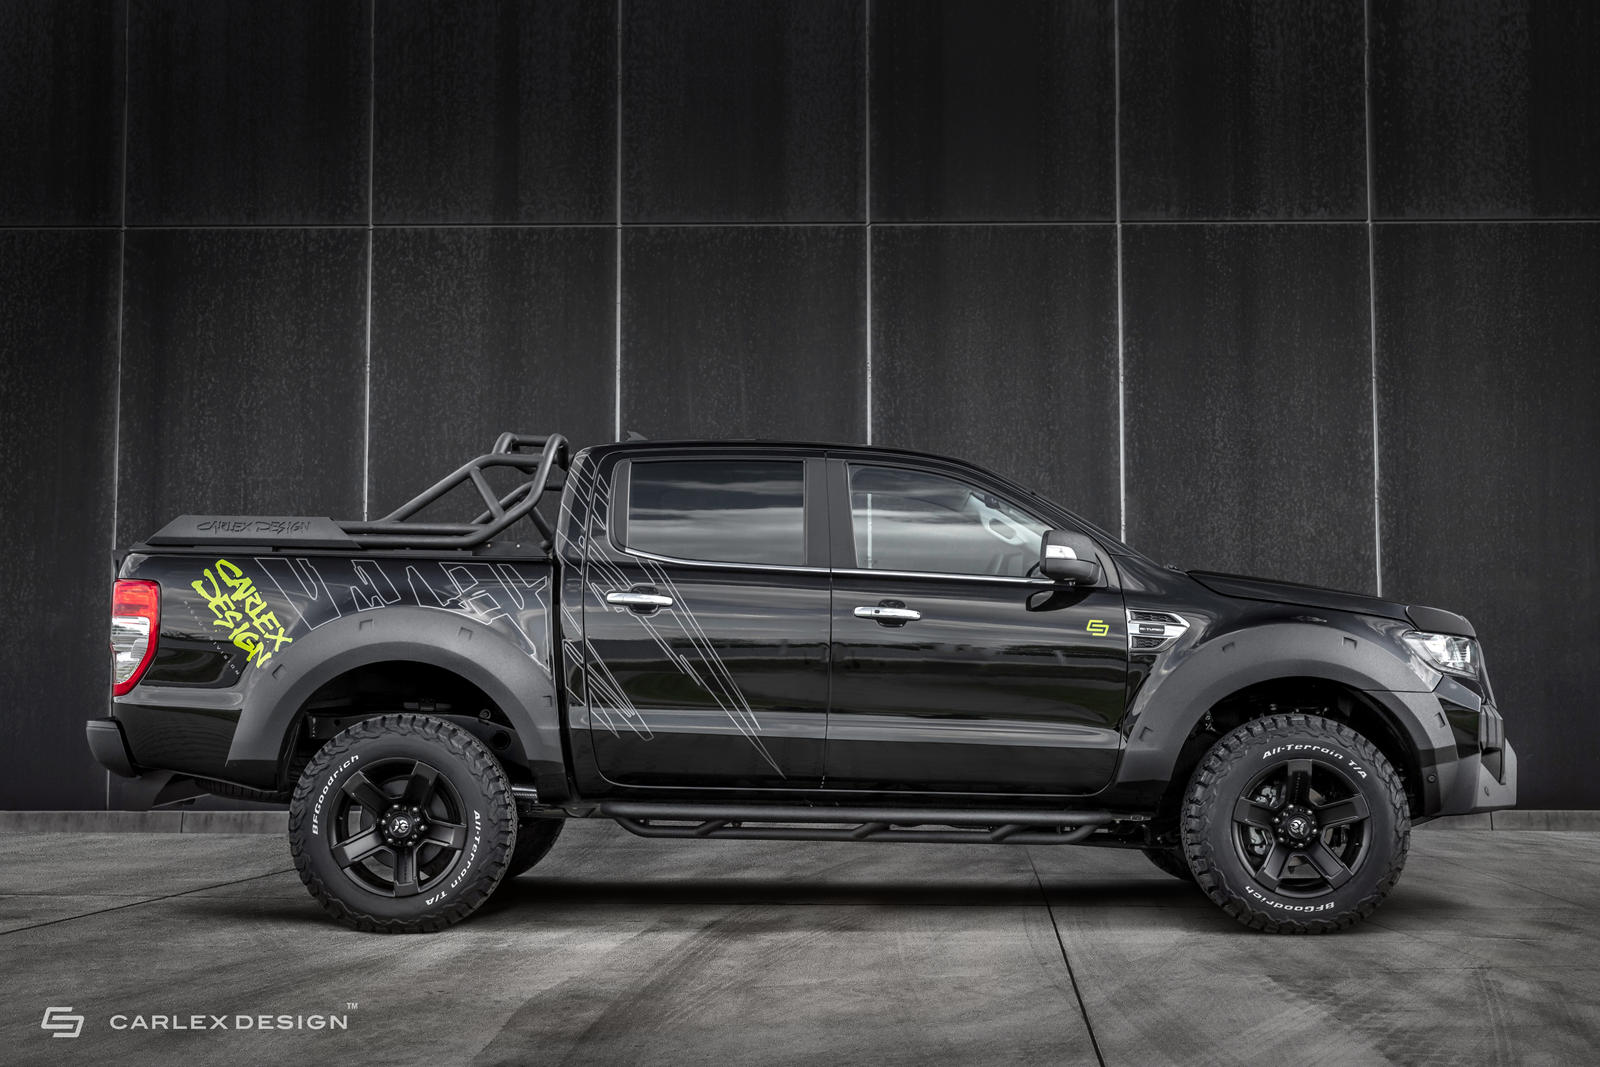 Ford_Ranger_Carlex_Design_0001